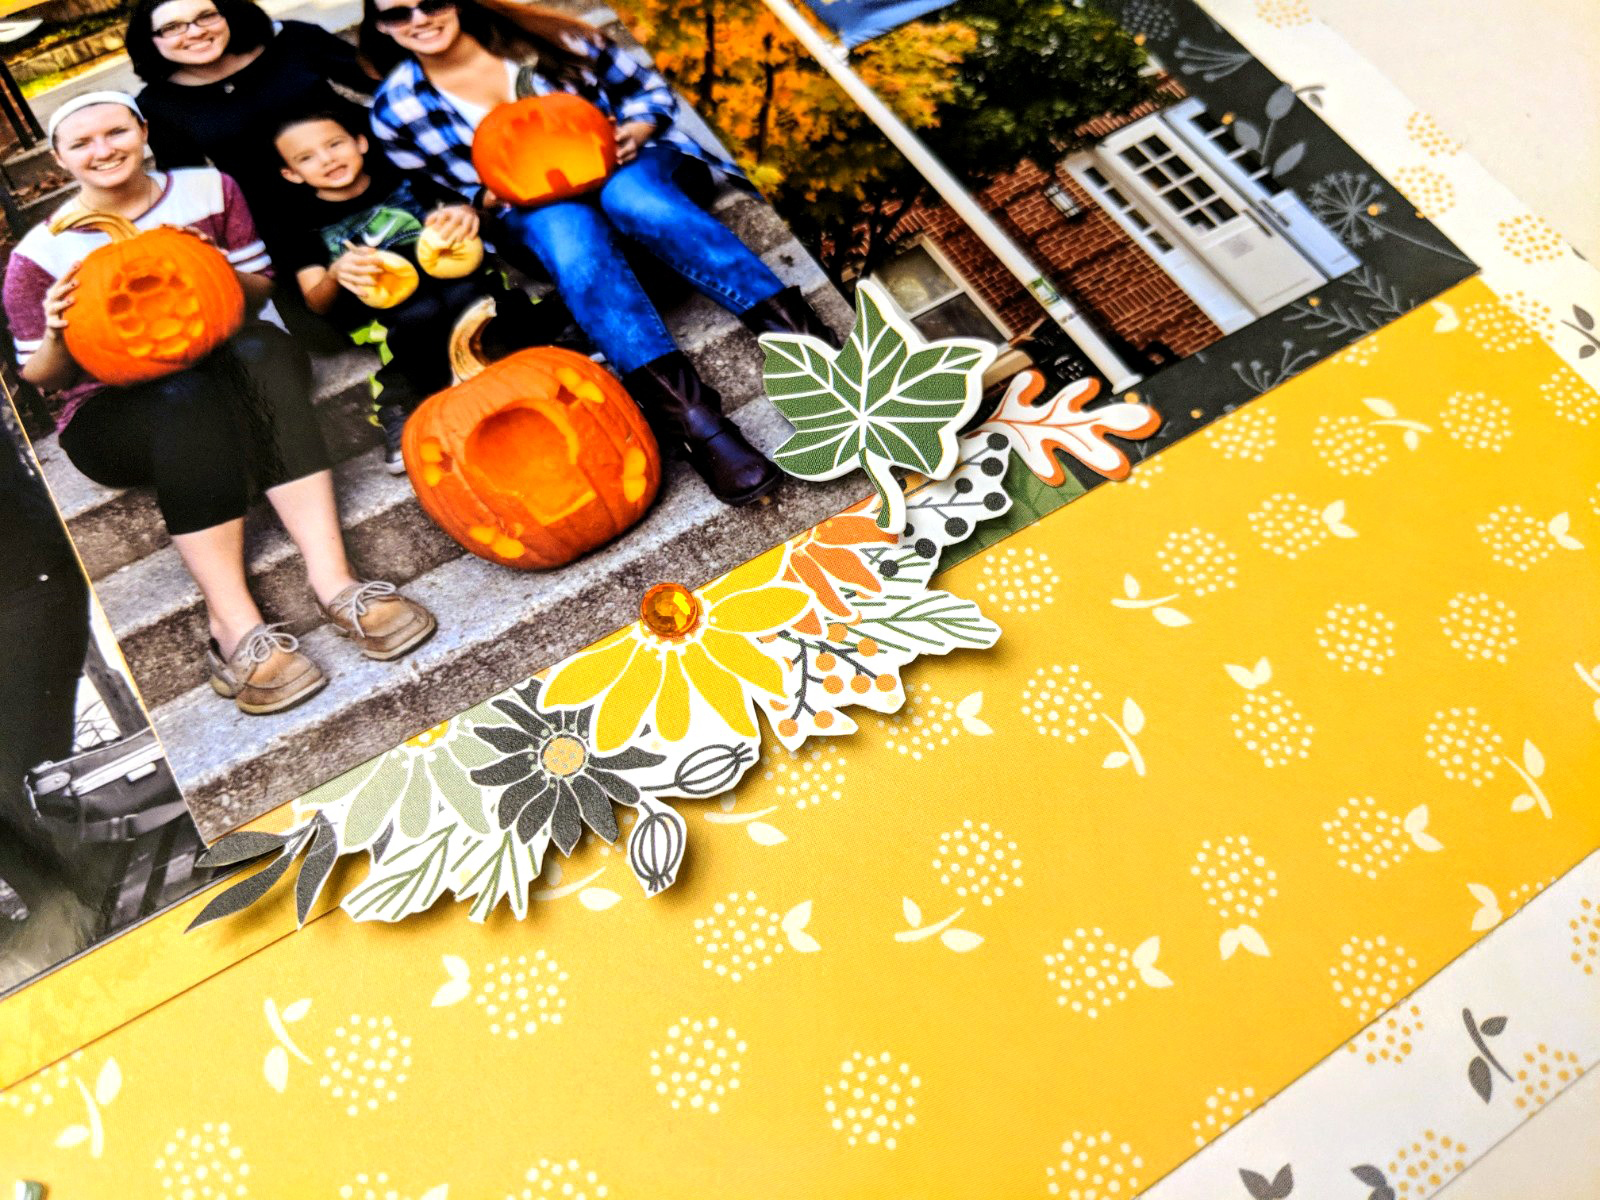 Gather-Together-Scrapbook-Layout-Process4Creative-Memories